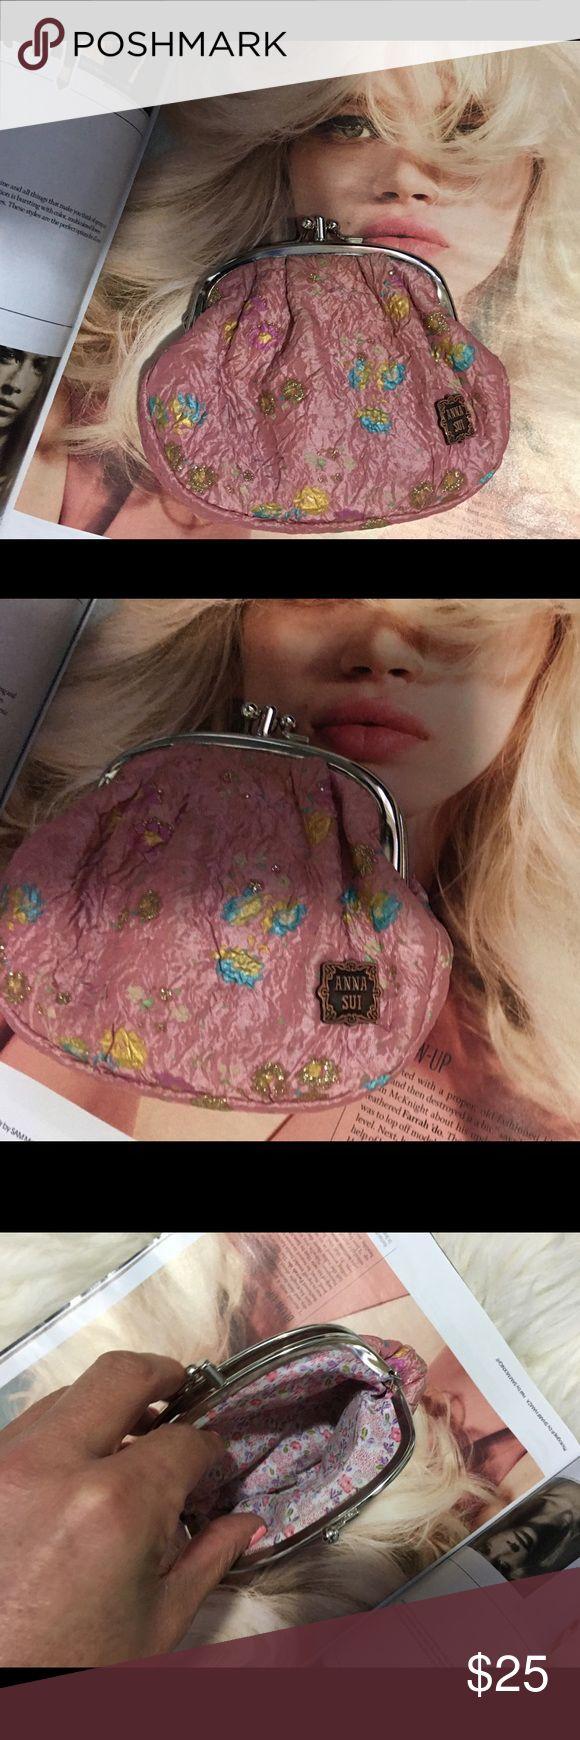 Anna Sui purse Small coin purse, Anthropologie bags